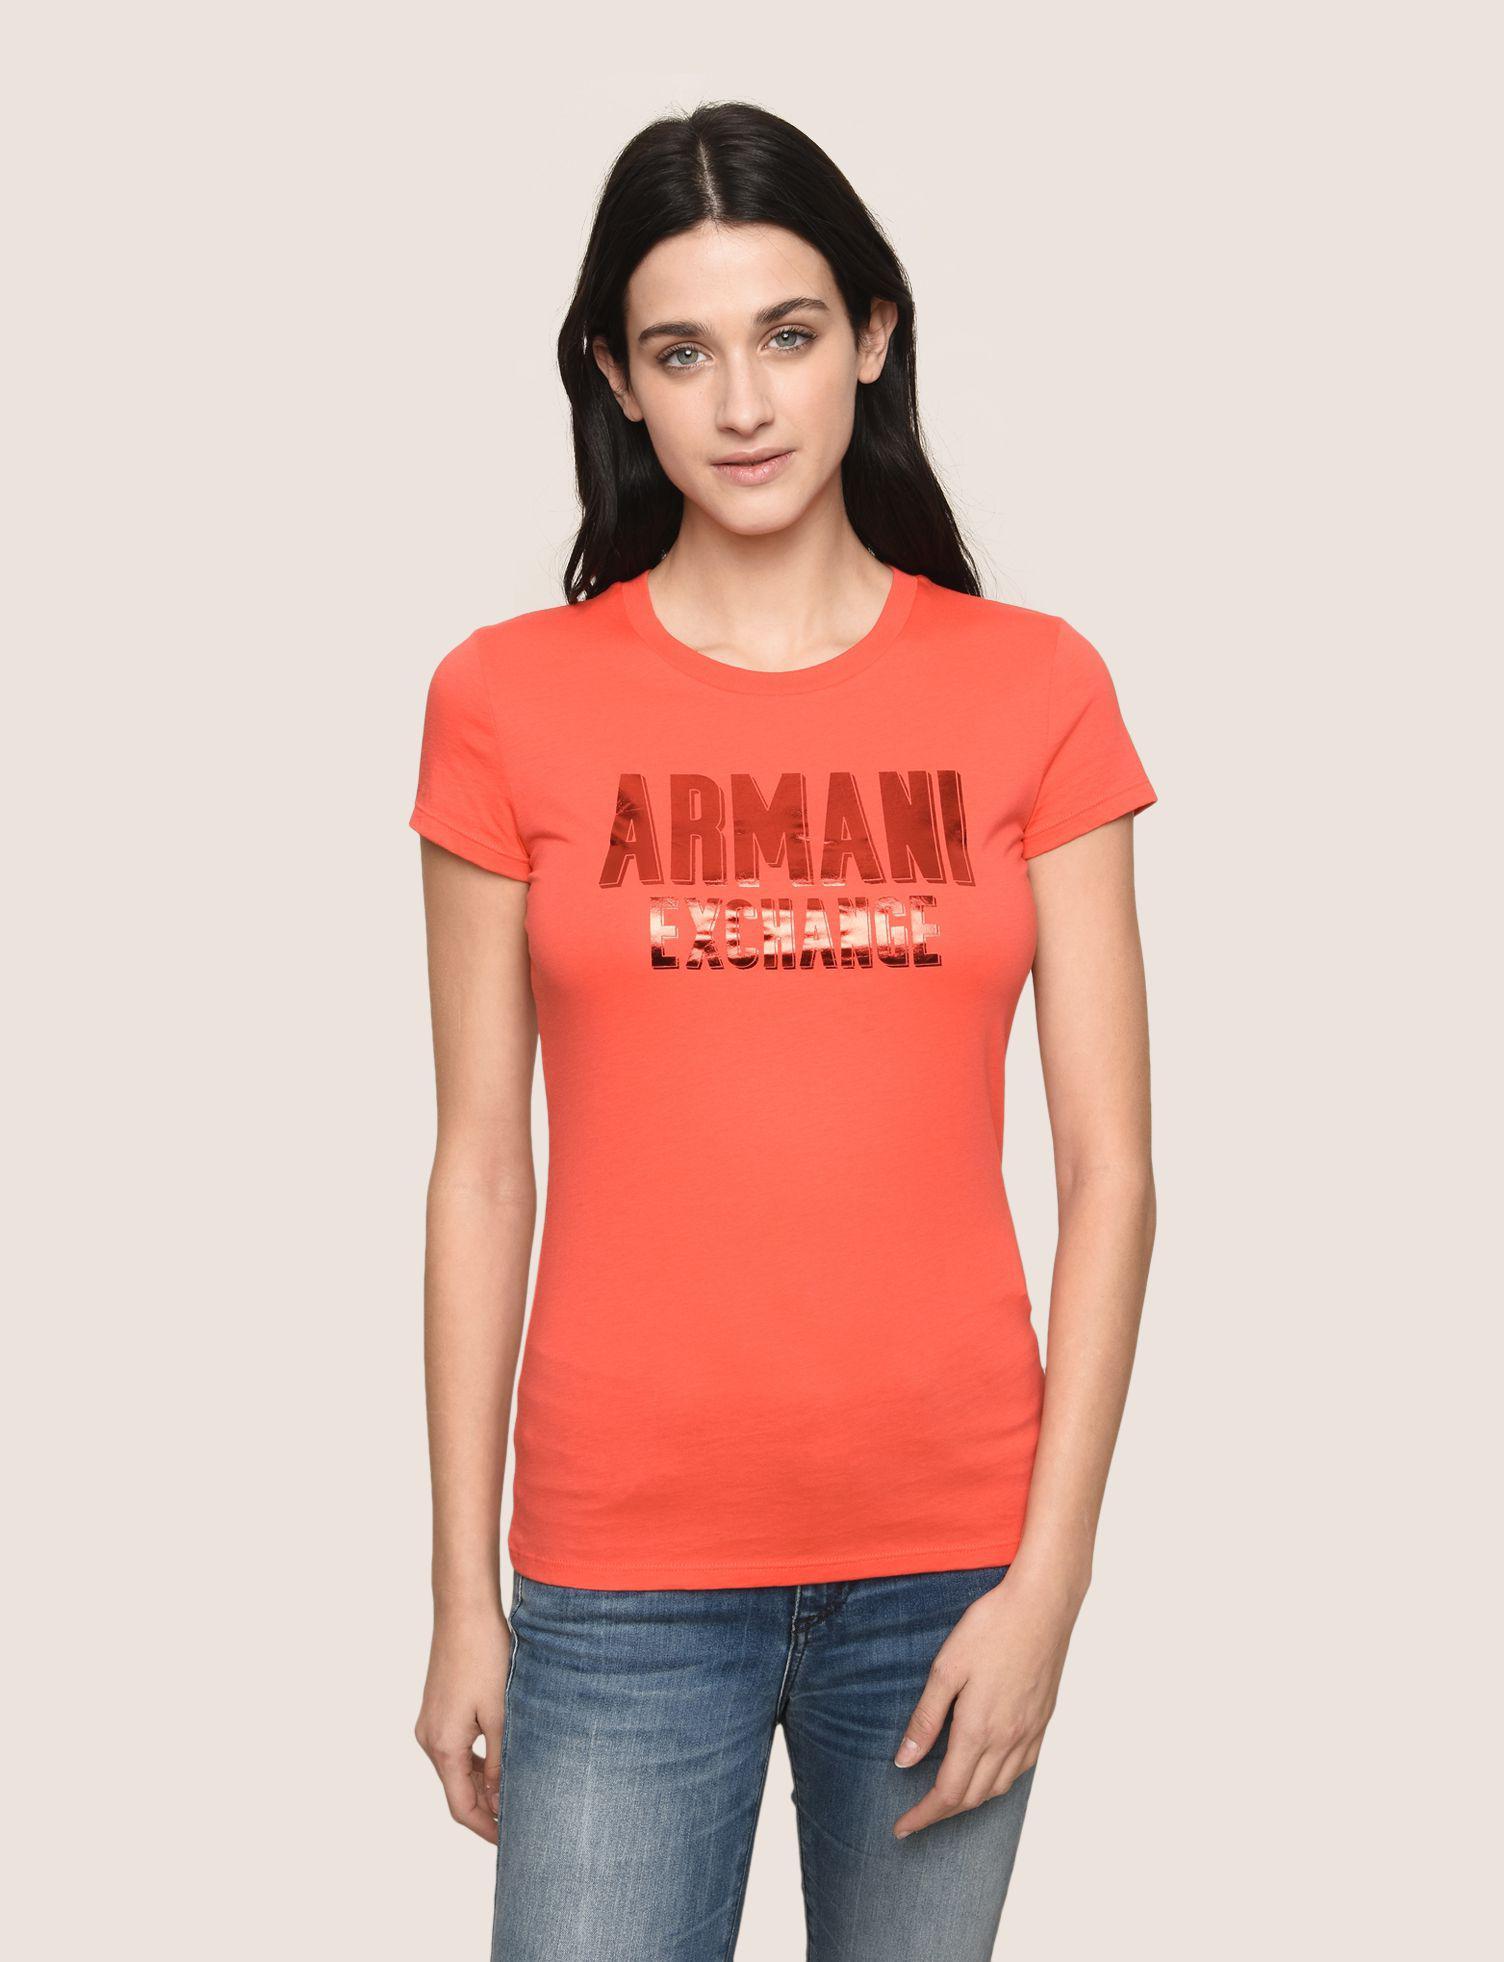 4eefad42c9c9a Lyst - Armani Exchange Tonal Glitter Block Tee in Red